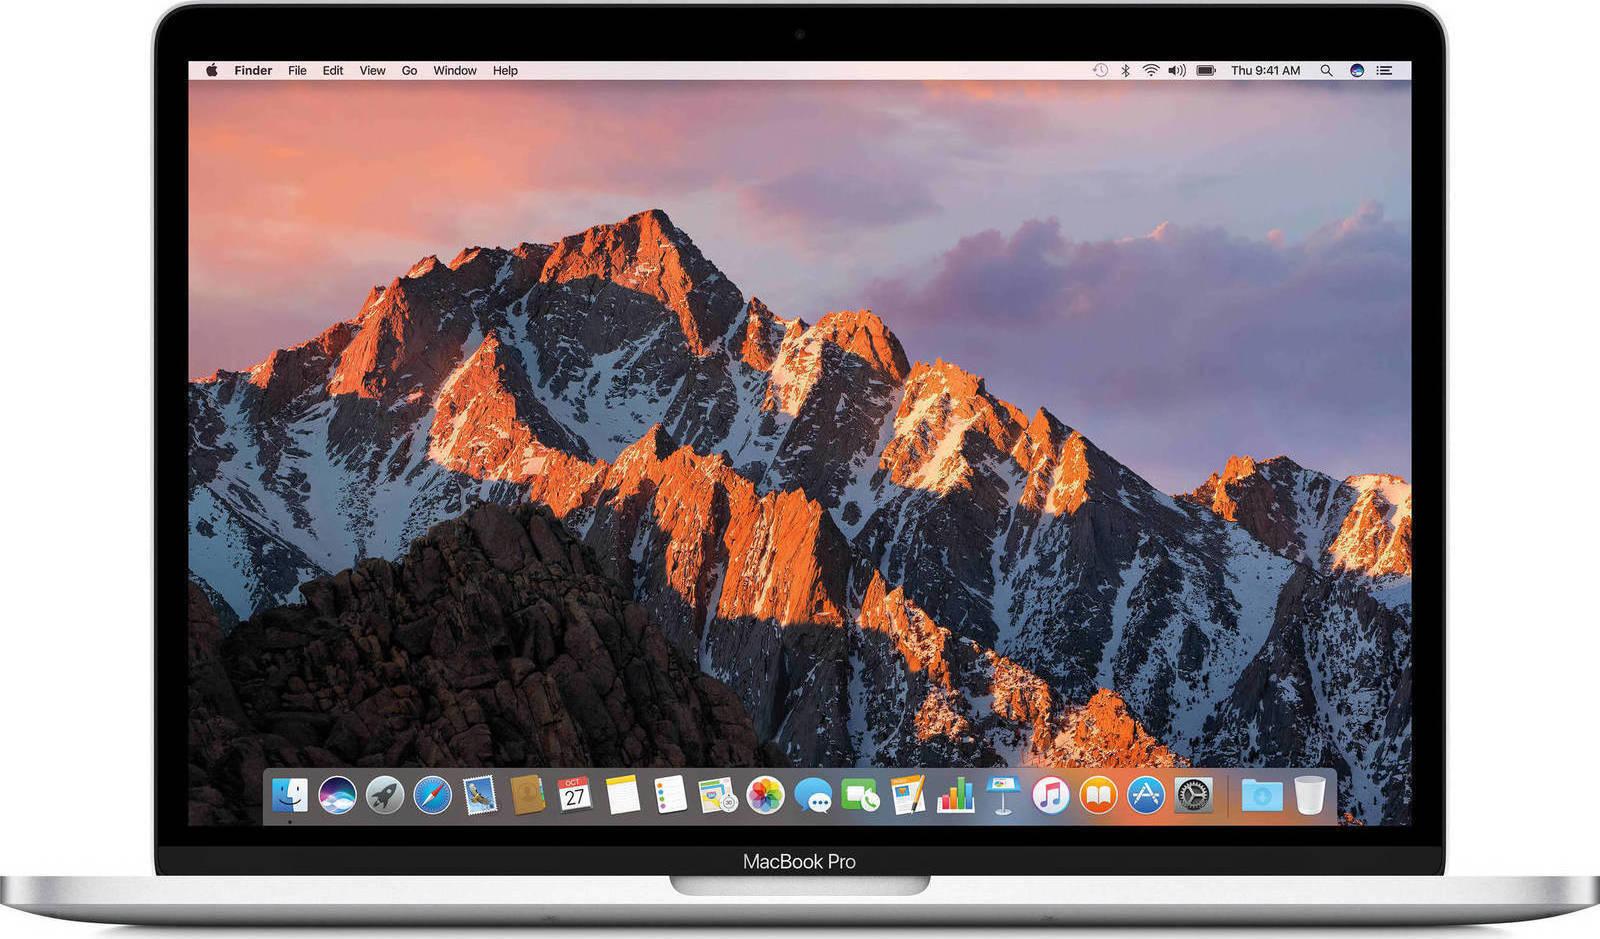 Apple MacBook Pro MPXR2 13.3'' 2.3GHz i5/8GB/128GB Silver English Keyboard Με Αντάπτορα Πληρωμή έως 24 δόσεις